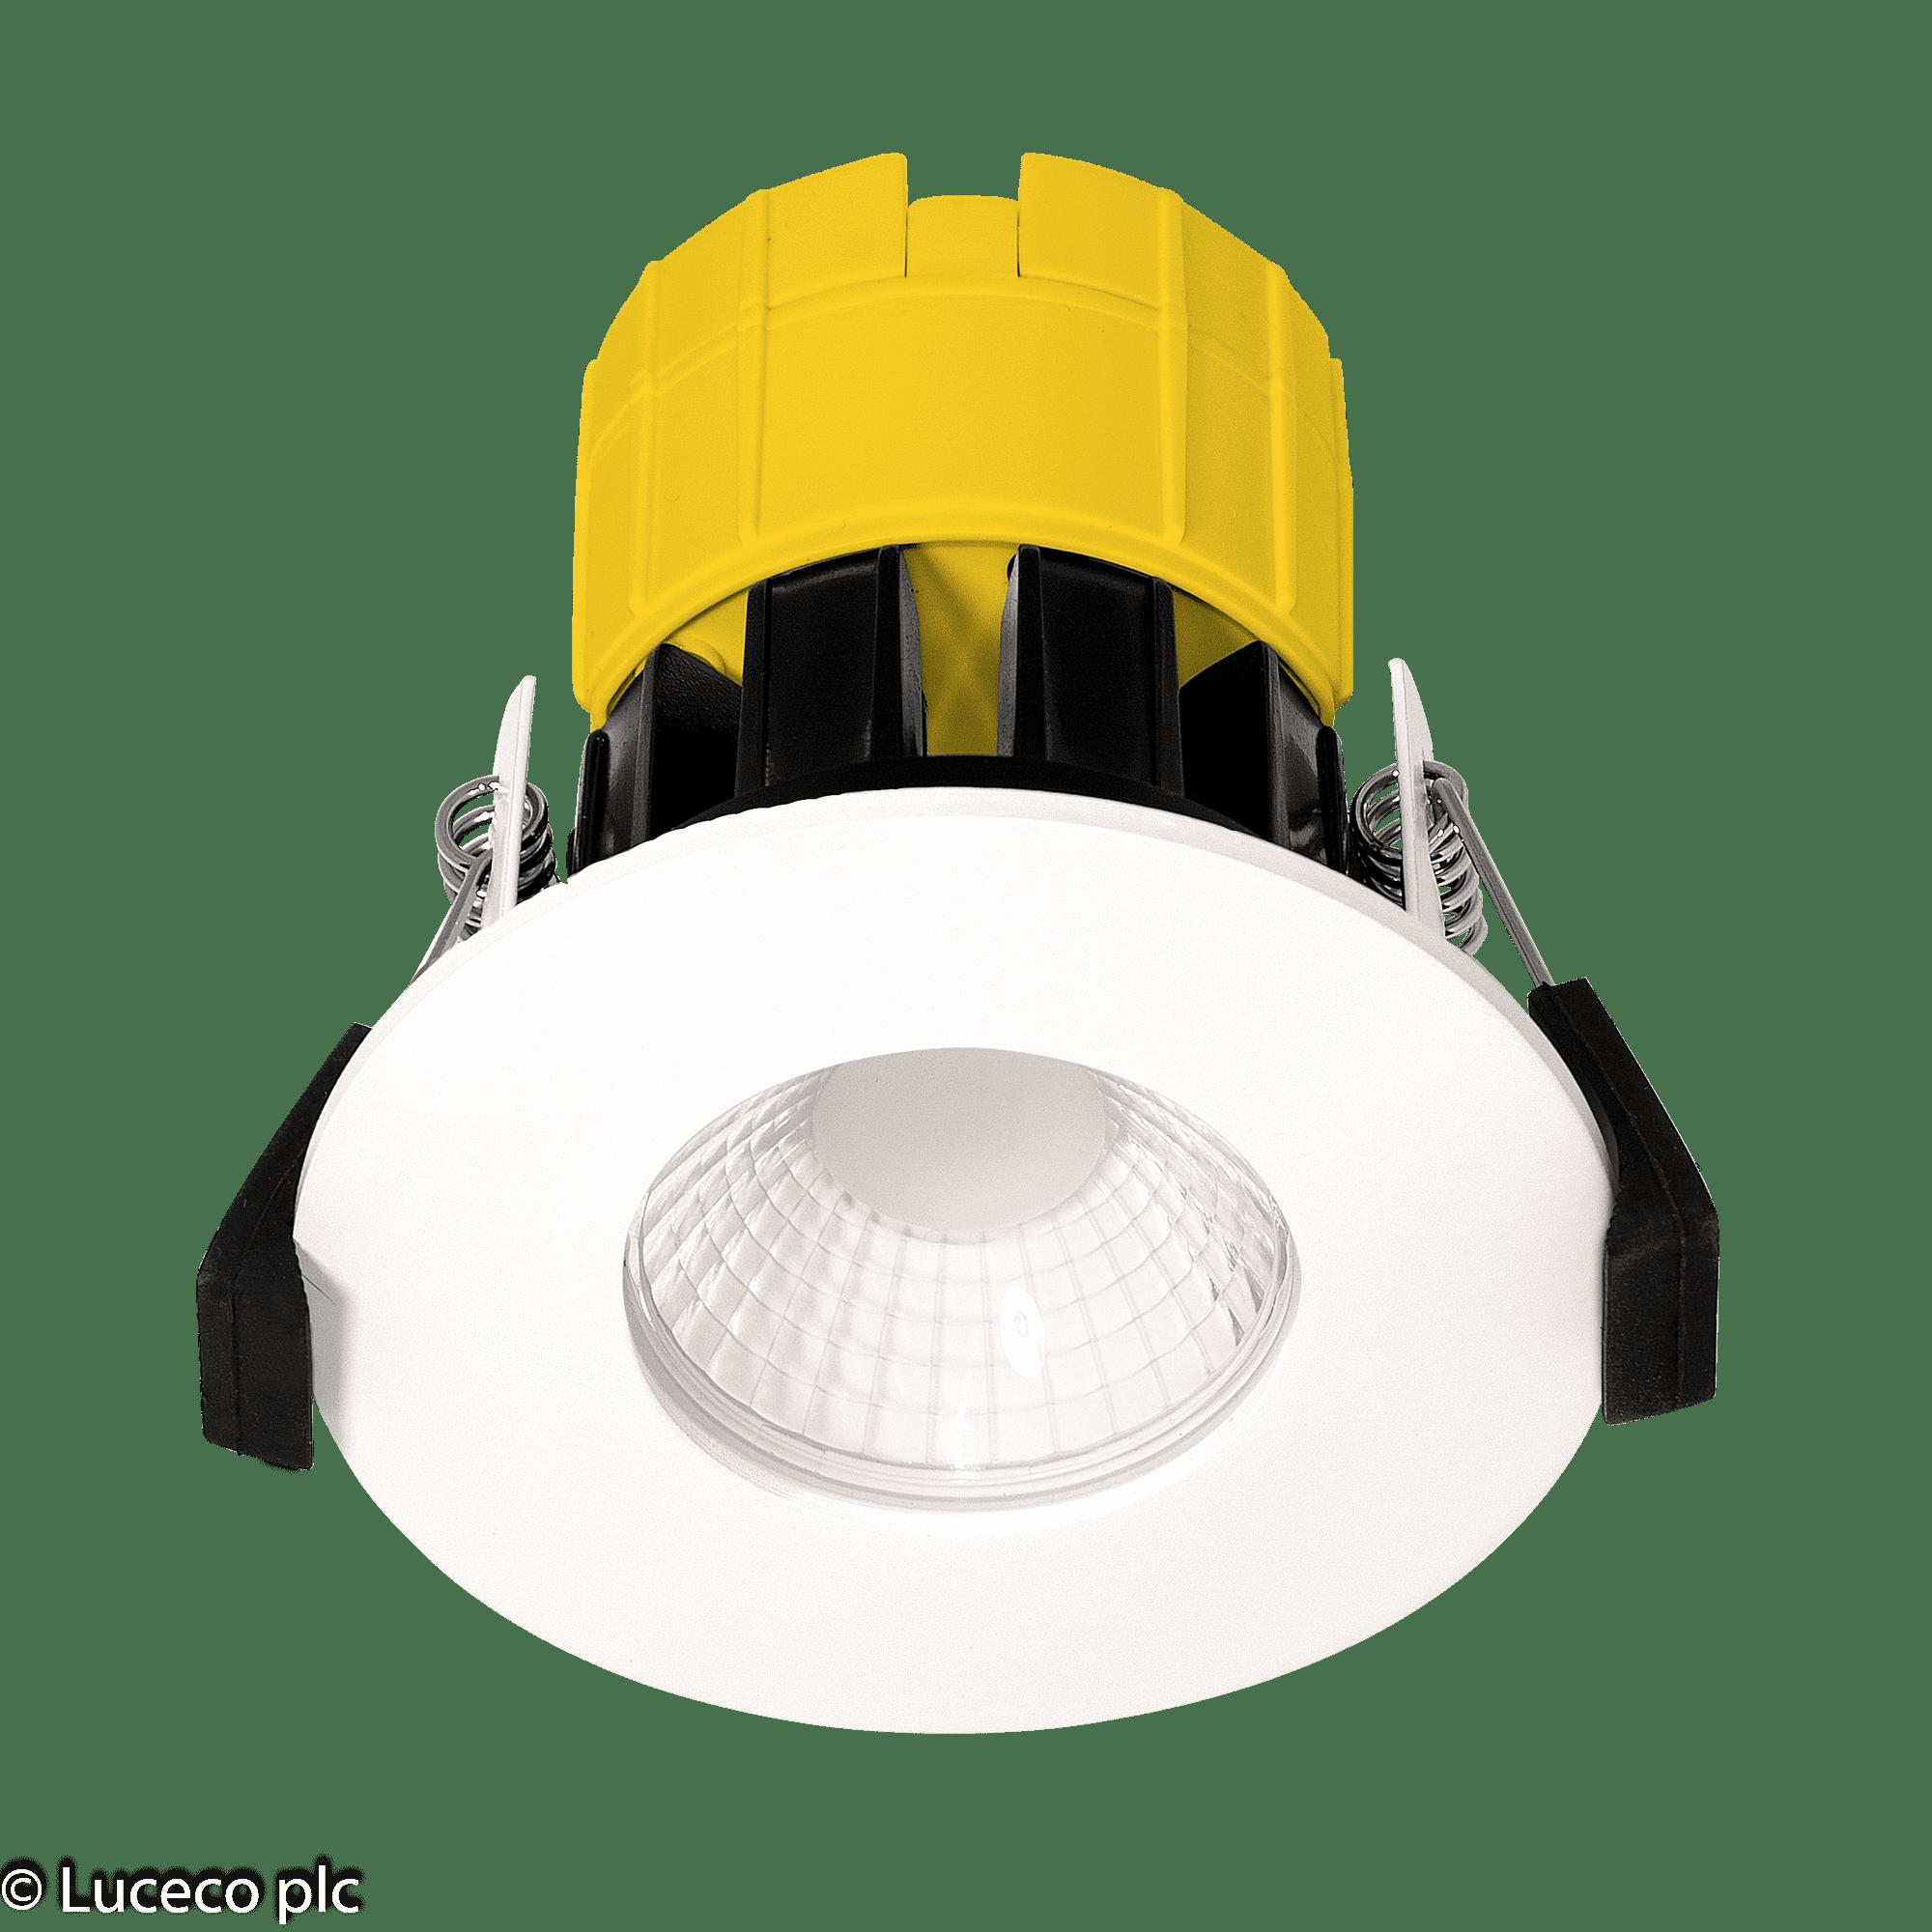 "Luceco LED Einbaustrahler ""FTYPE"" 6W 460lm 2200-2700K dim. IP65 weiss #EFTD2W"